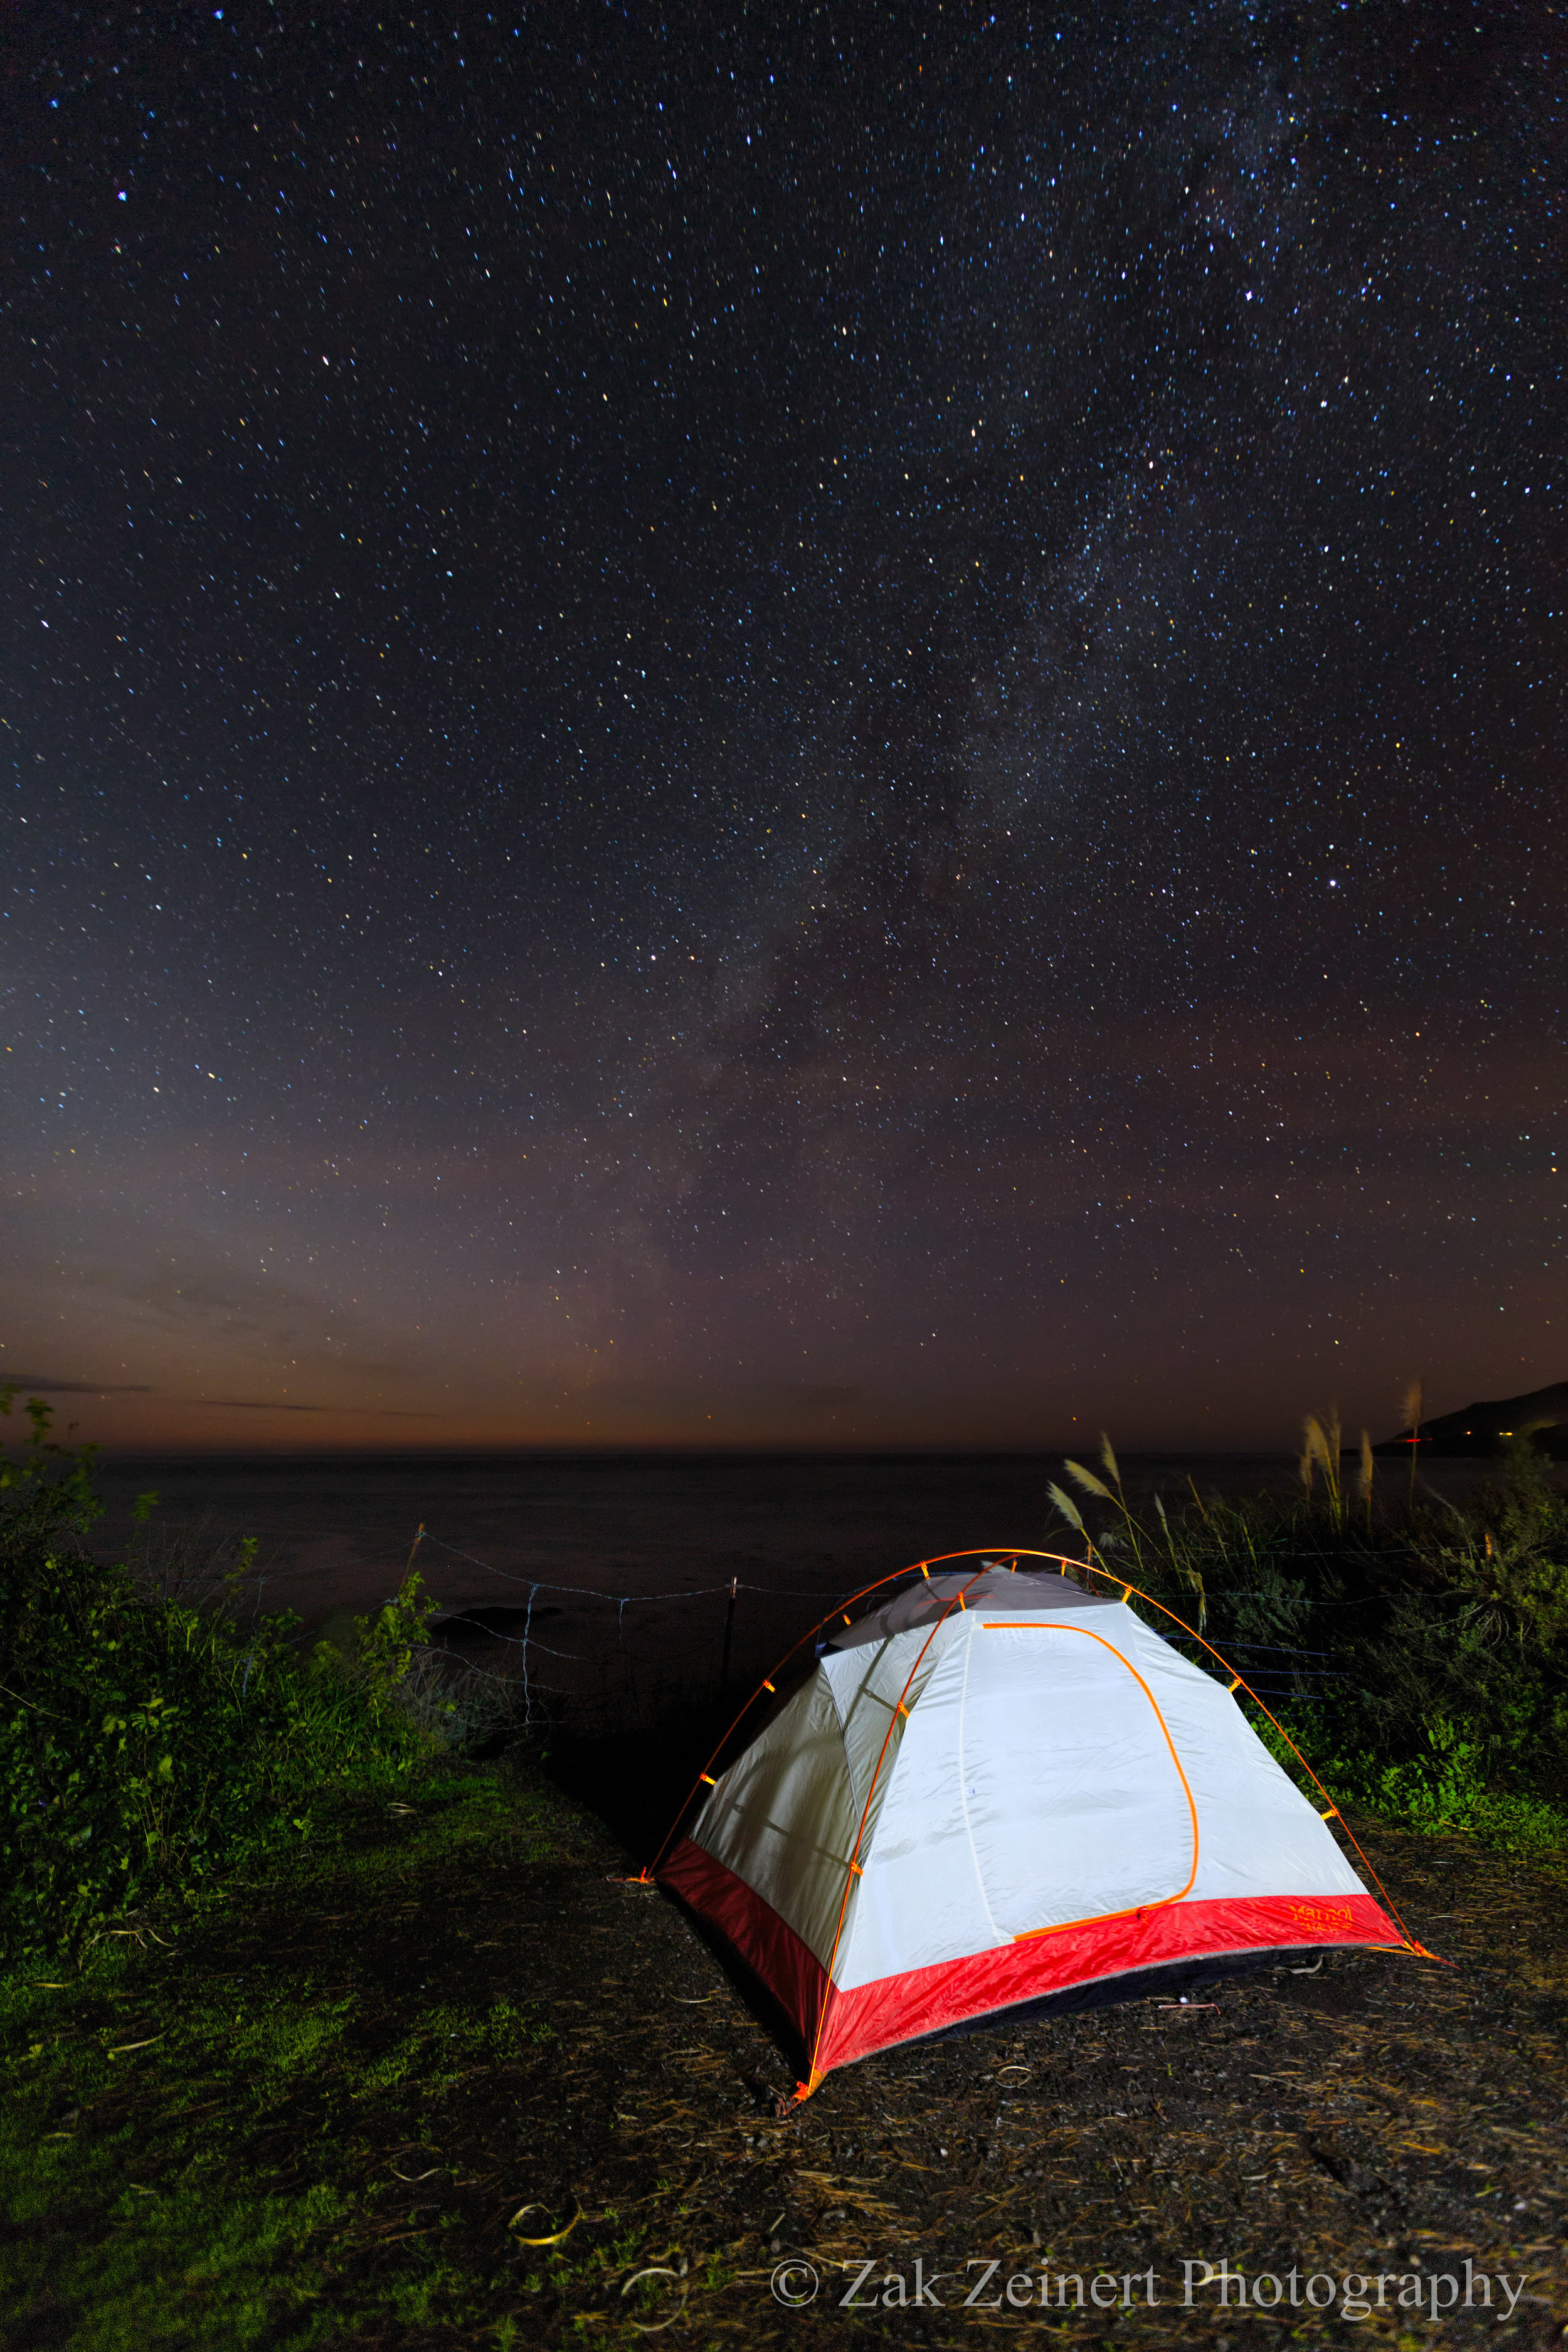 My last night at Kirk Creek Campground in Big Sur